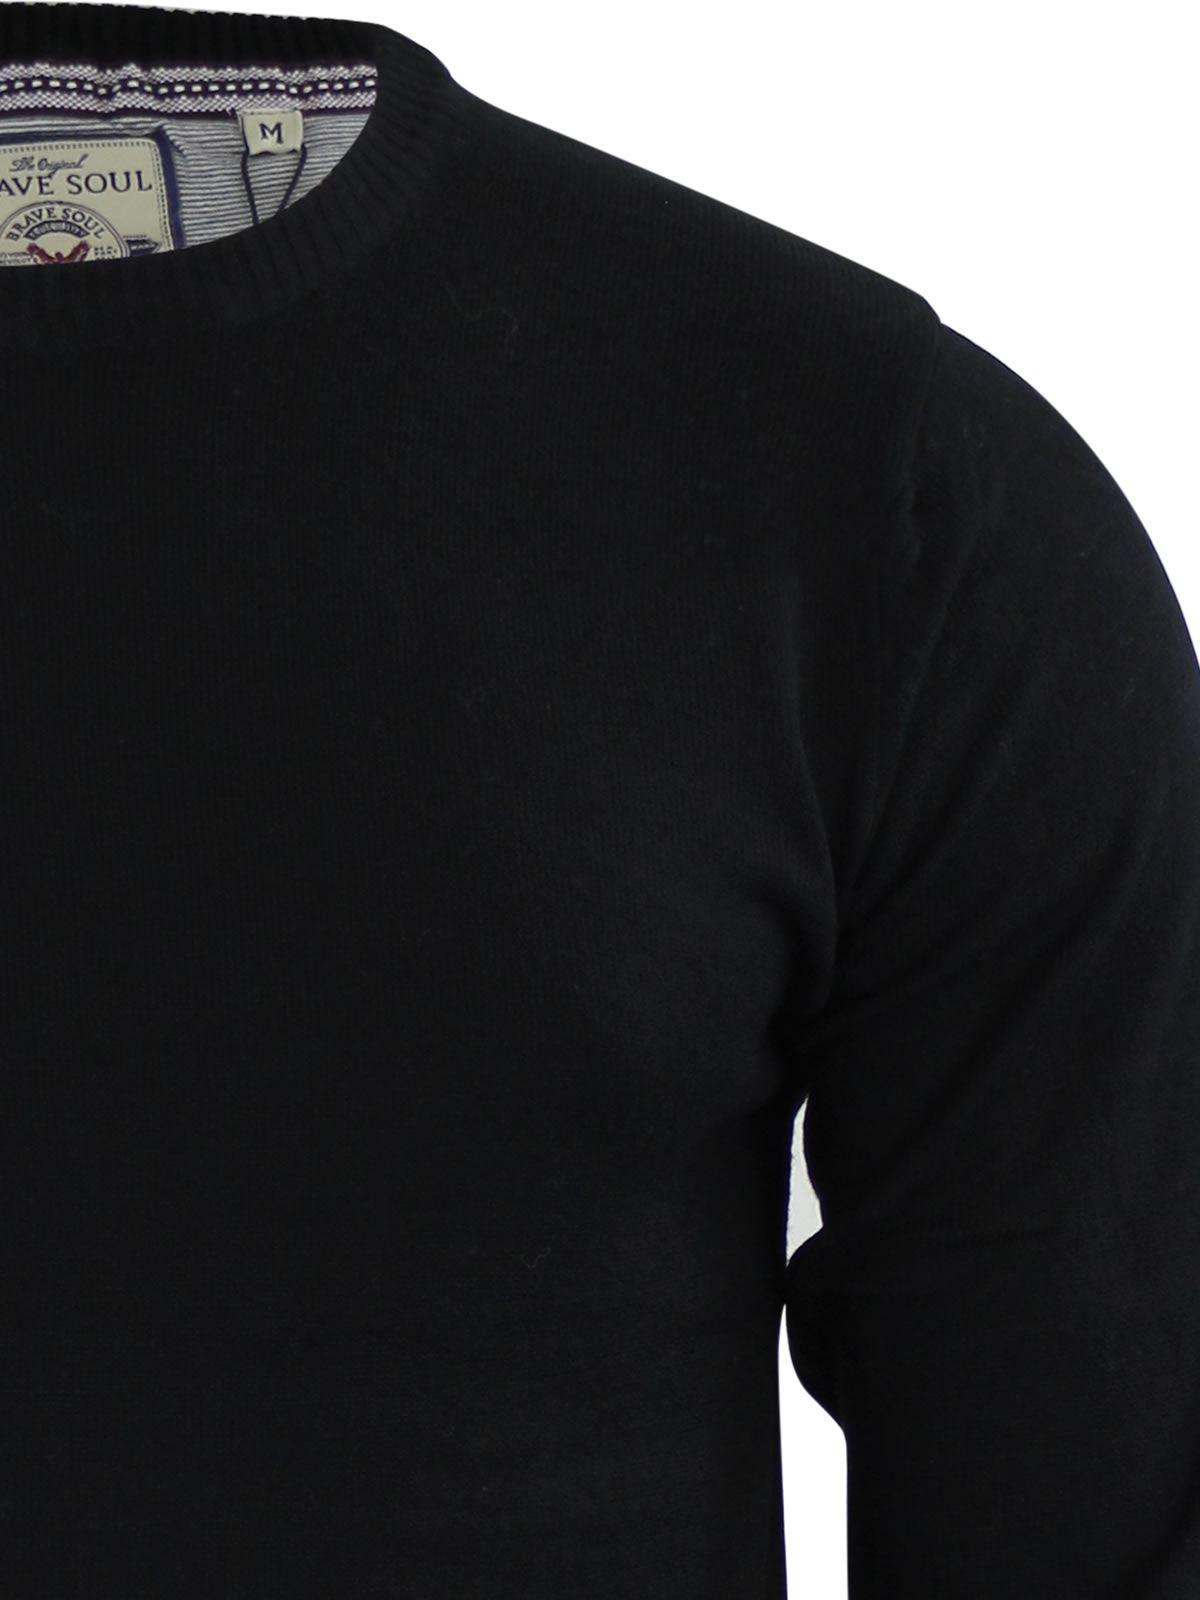 Brave-Soul-Urbain-Mens-Jumper-Knitted-Crew-Neck-Sweater thumbnail 30